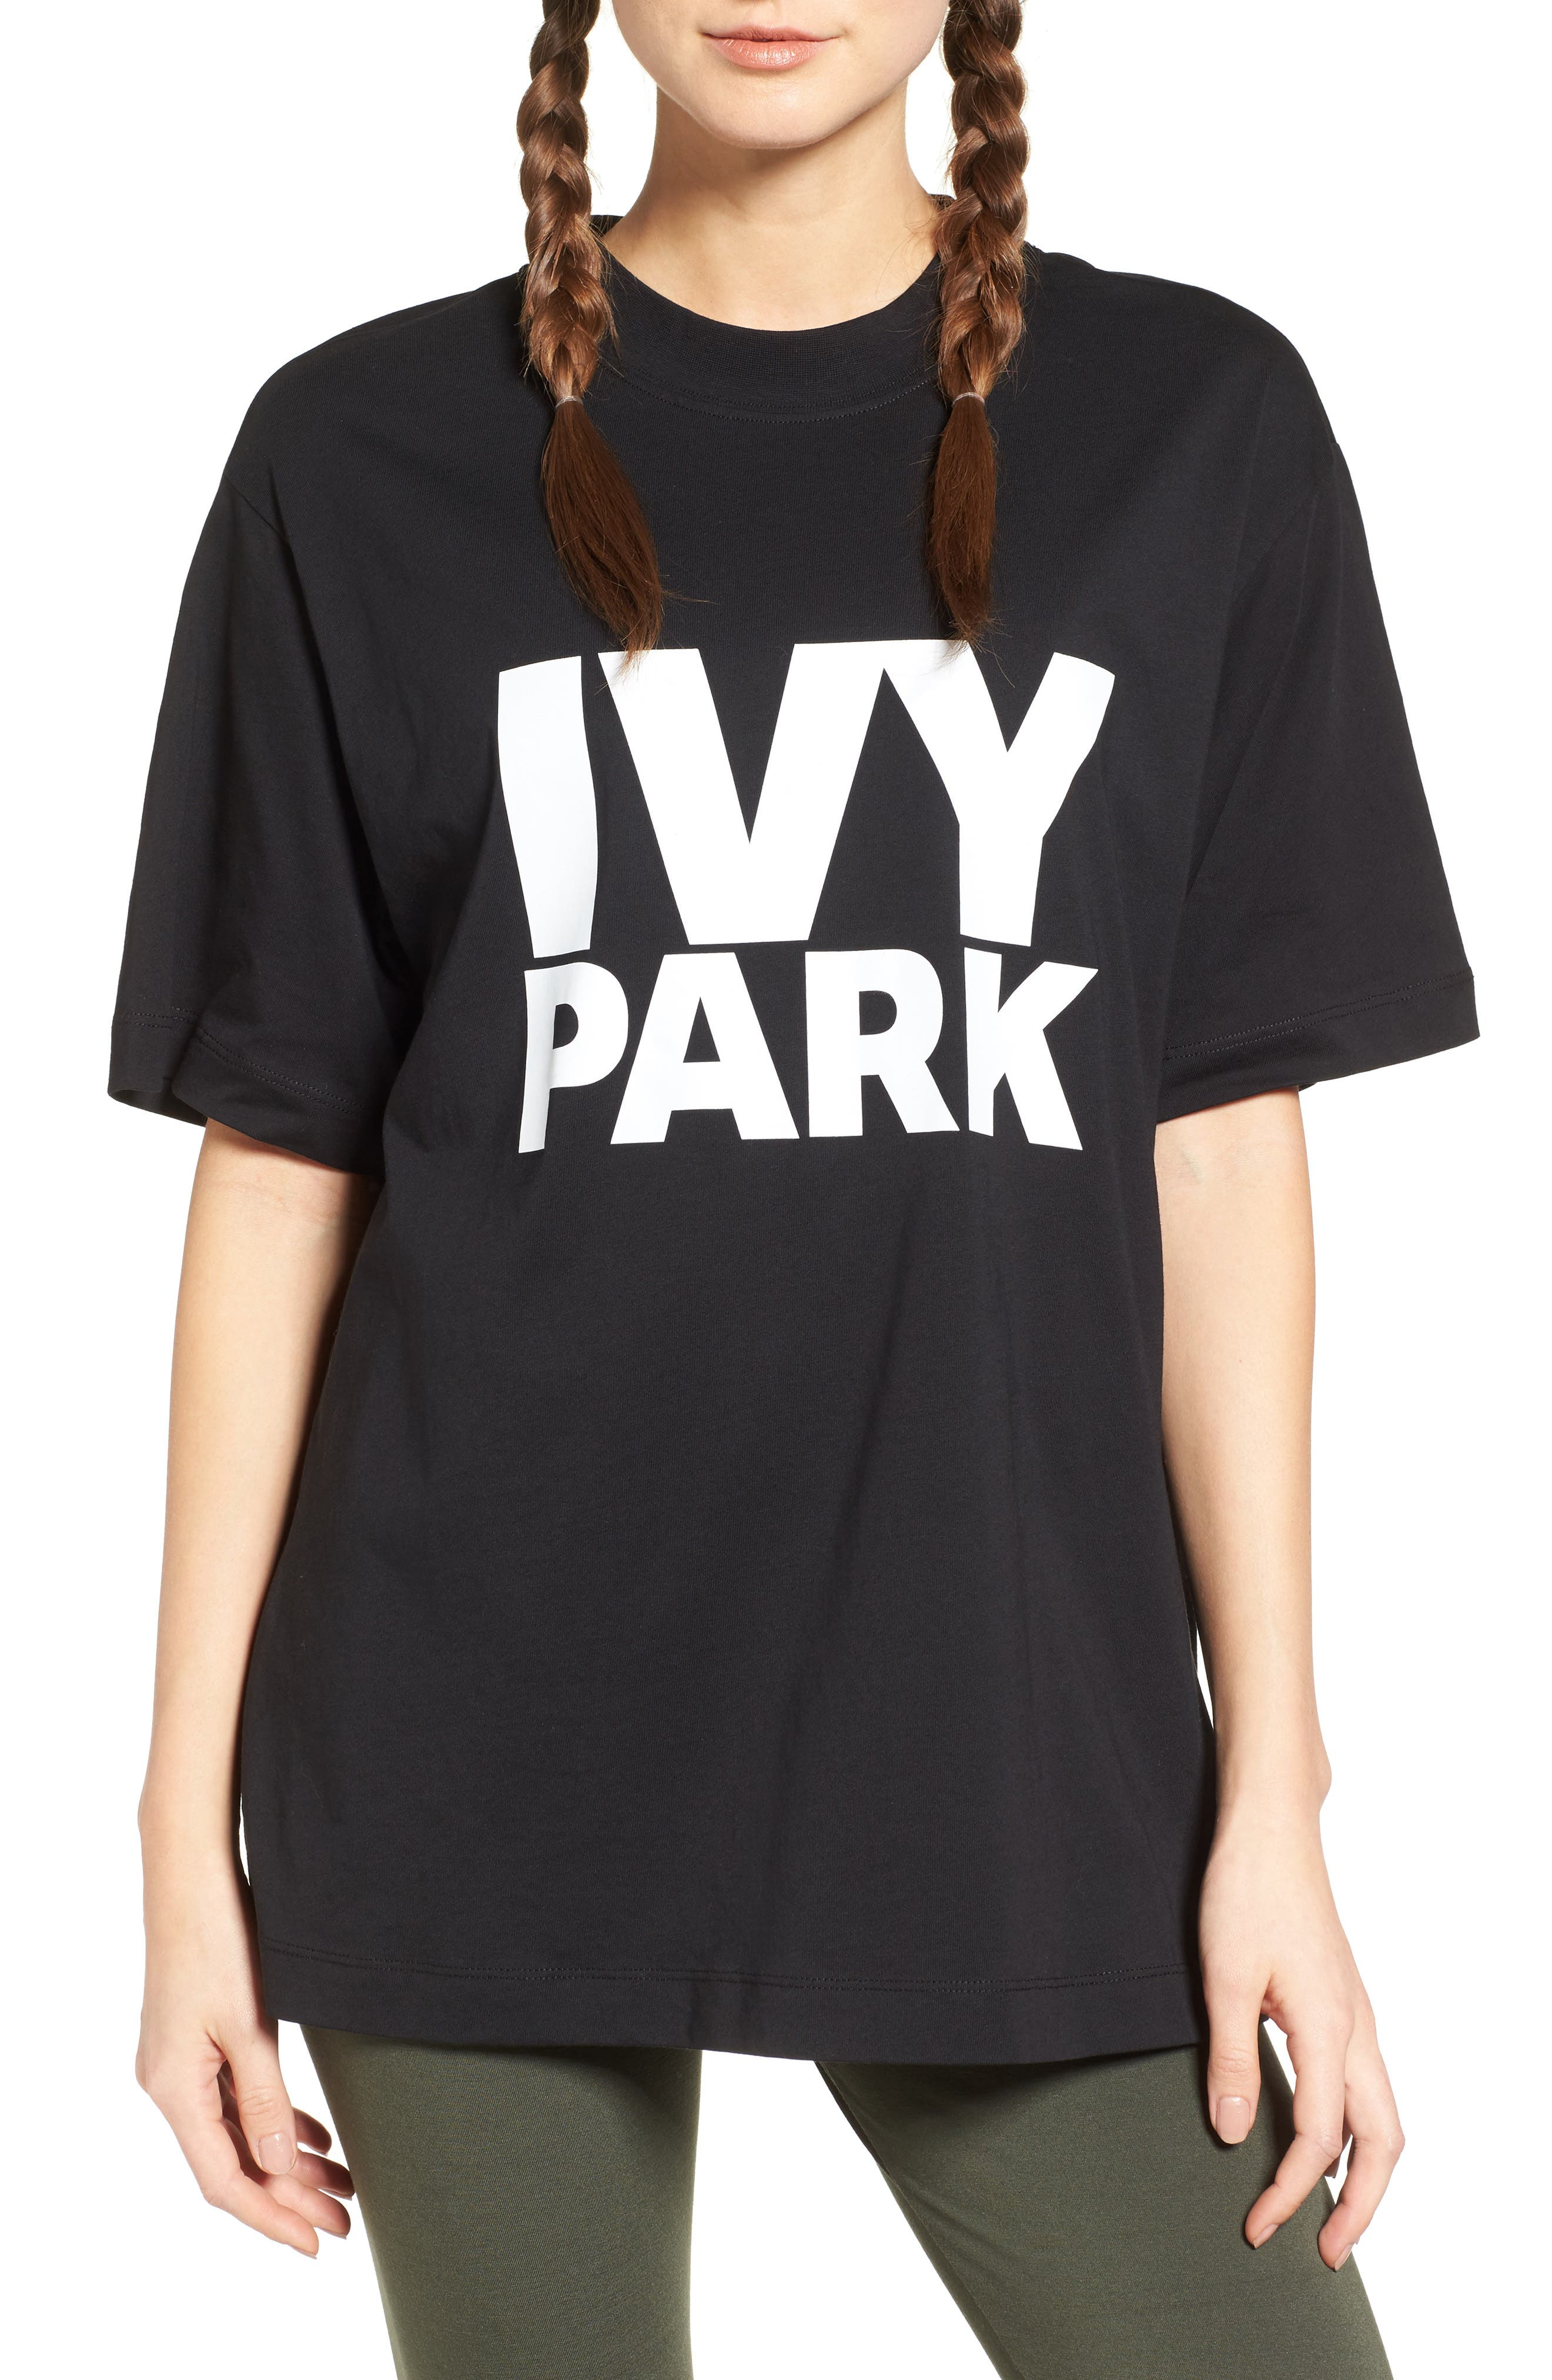 IVY PARK® Logo Tee